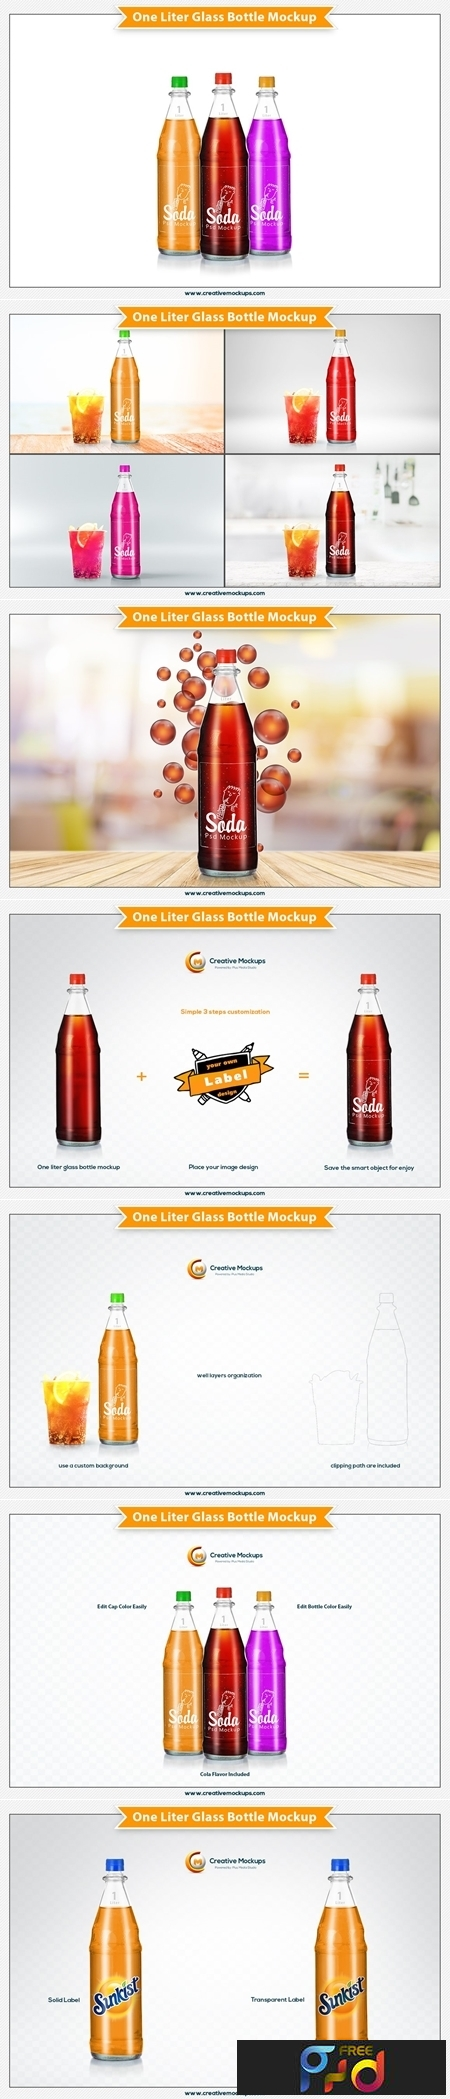 One Liter Glass Bottle Mockup 3505186 1